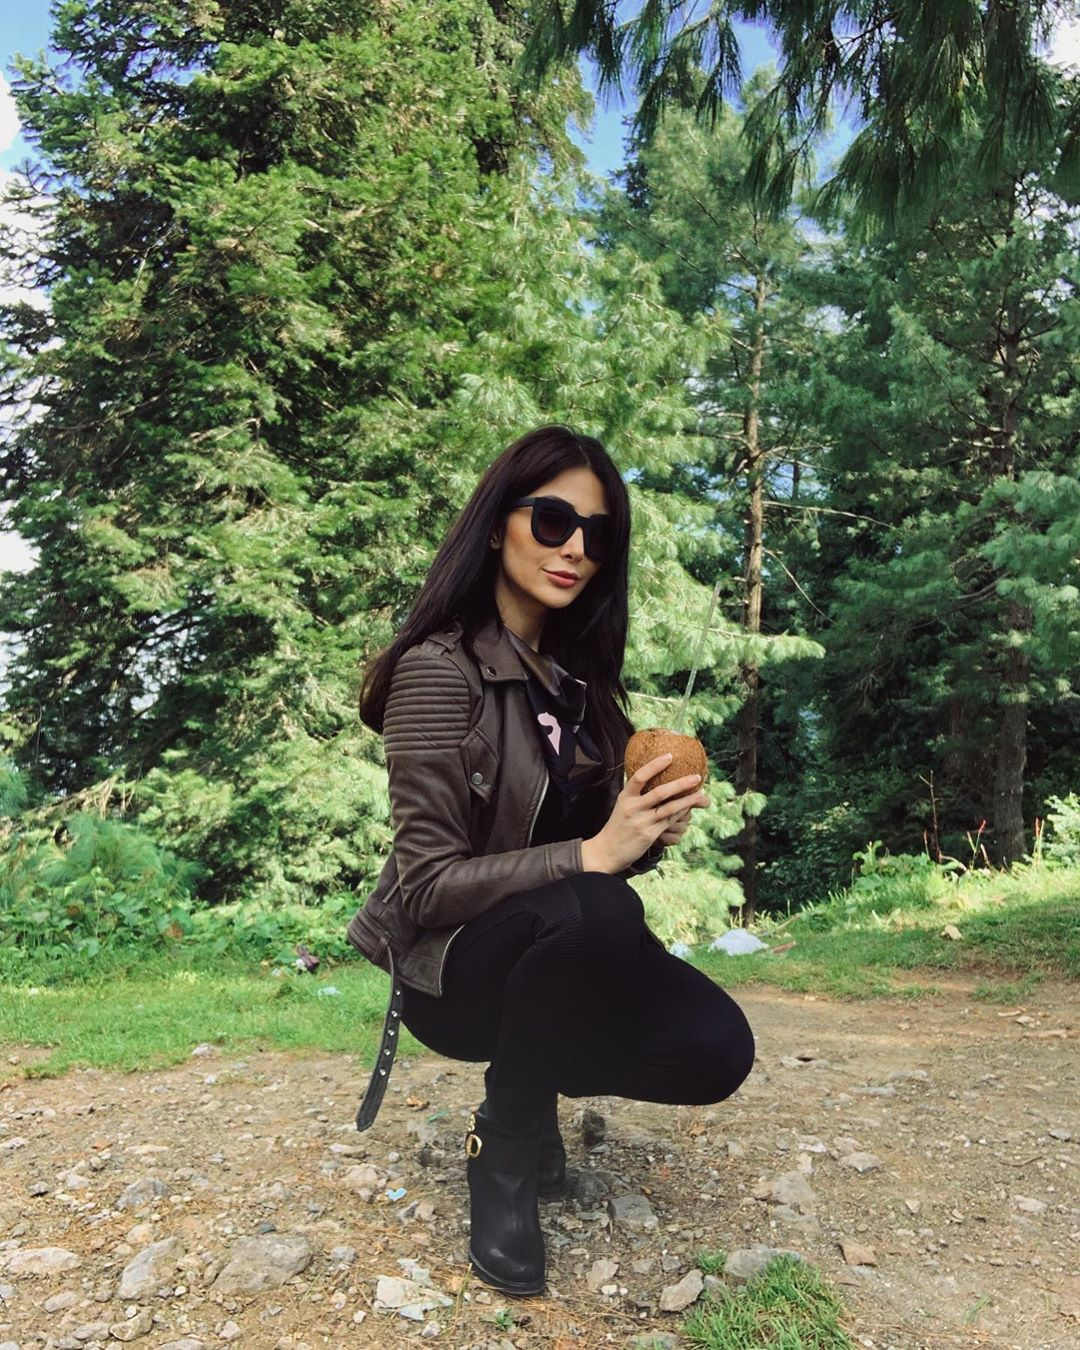 Model Sabeeka Imam Beautiful Pictures in Nathia Gali (12)